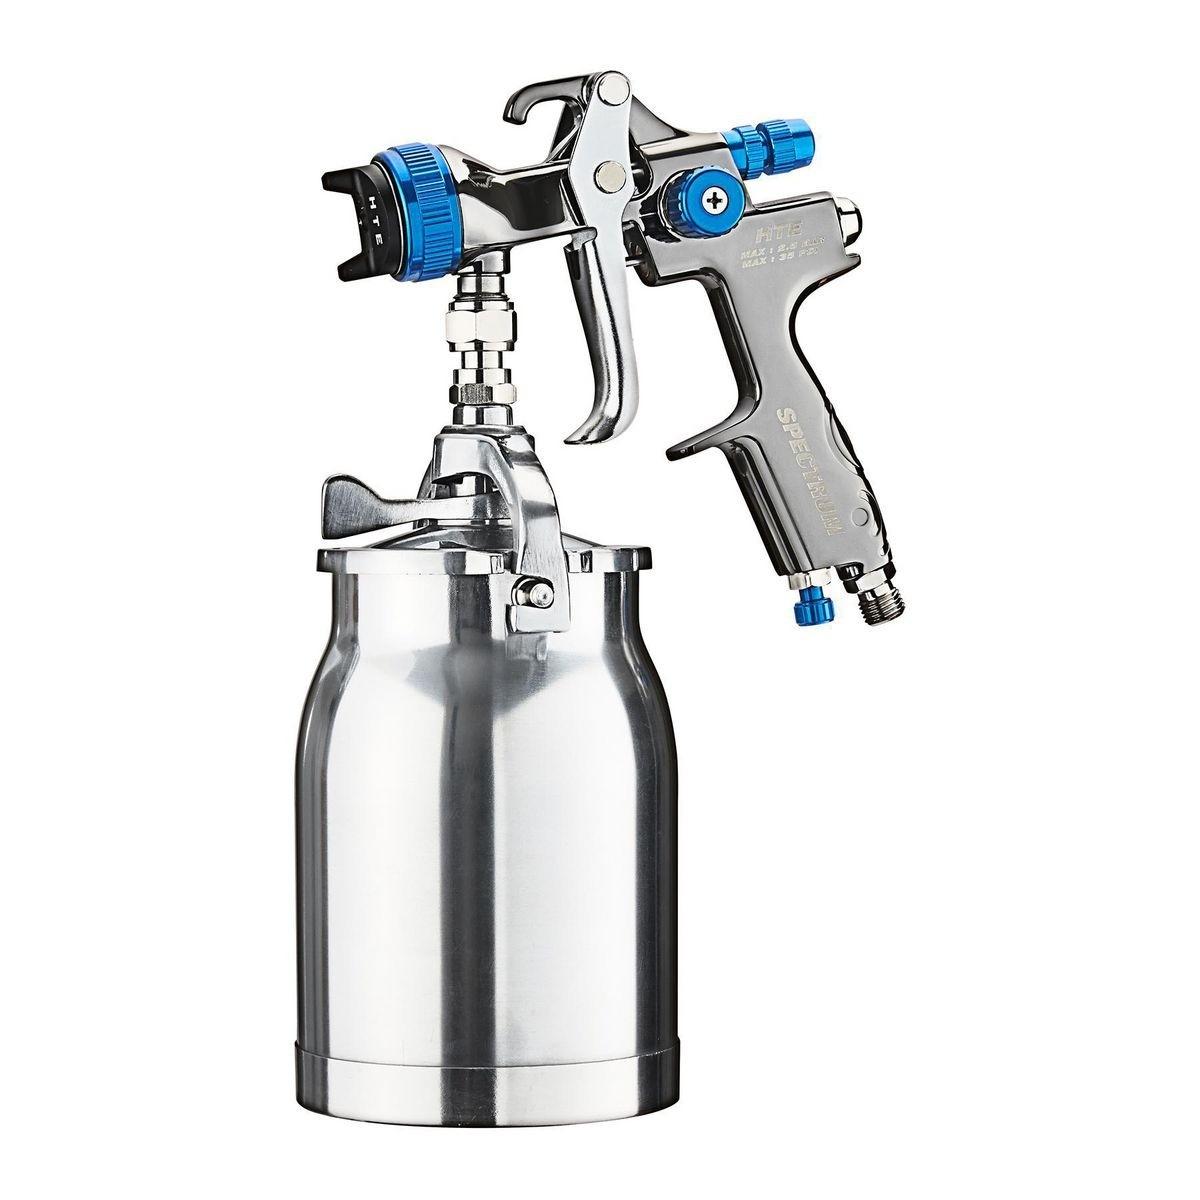 SPECTRUM 32 Oz. Professional HTE Compliant Siphon Air Spray Gun – Item 56338